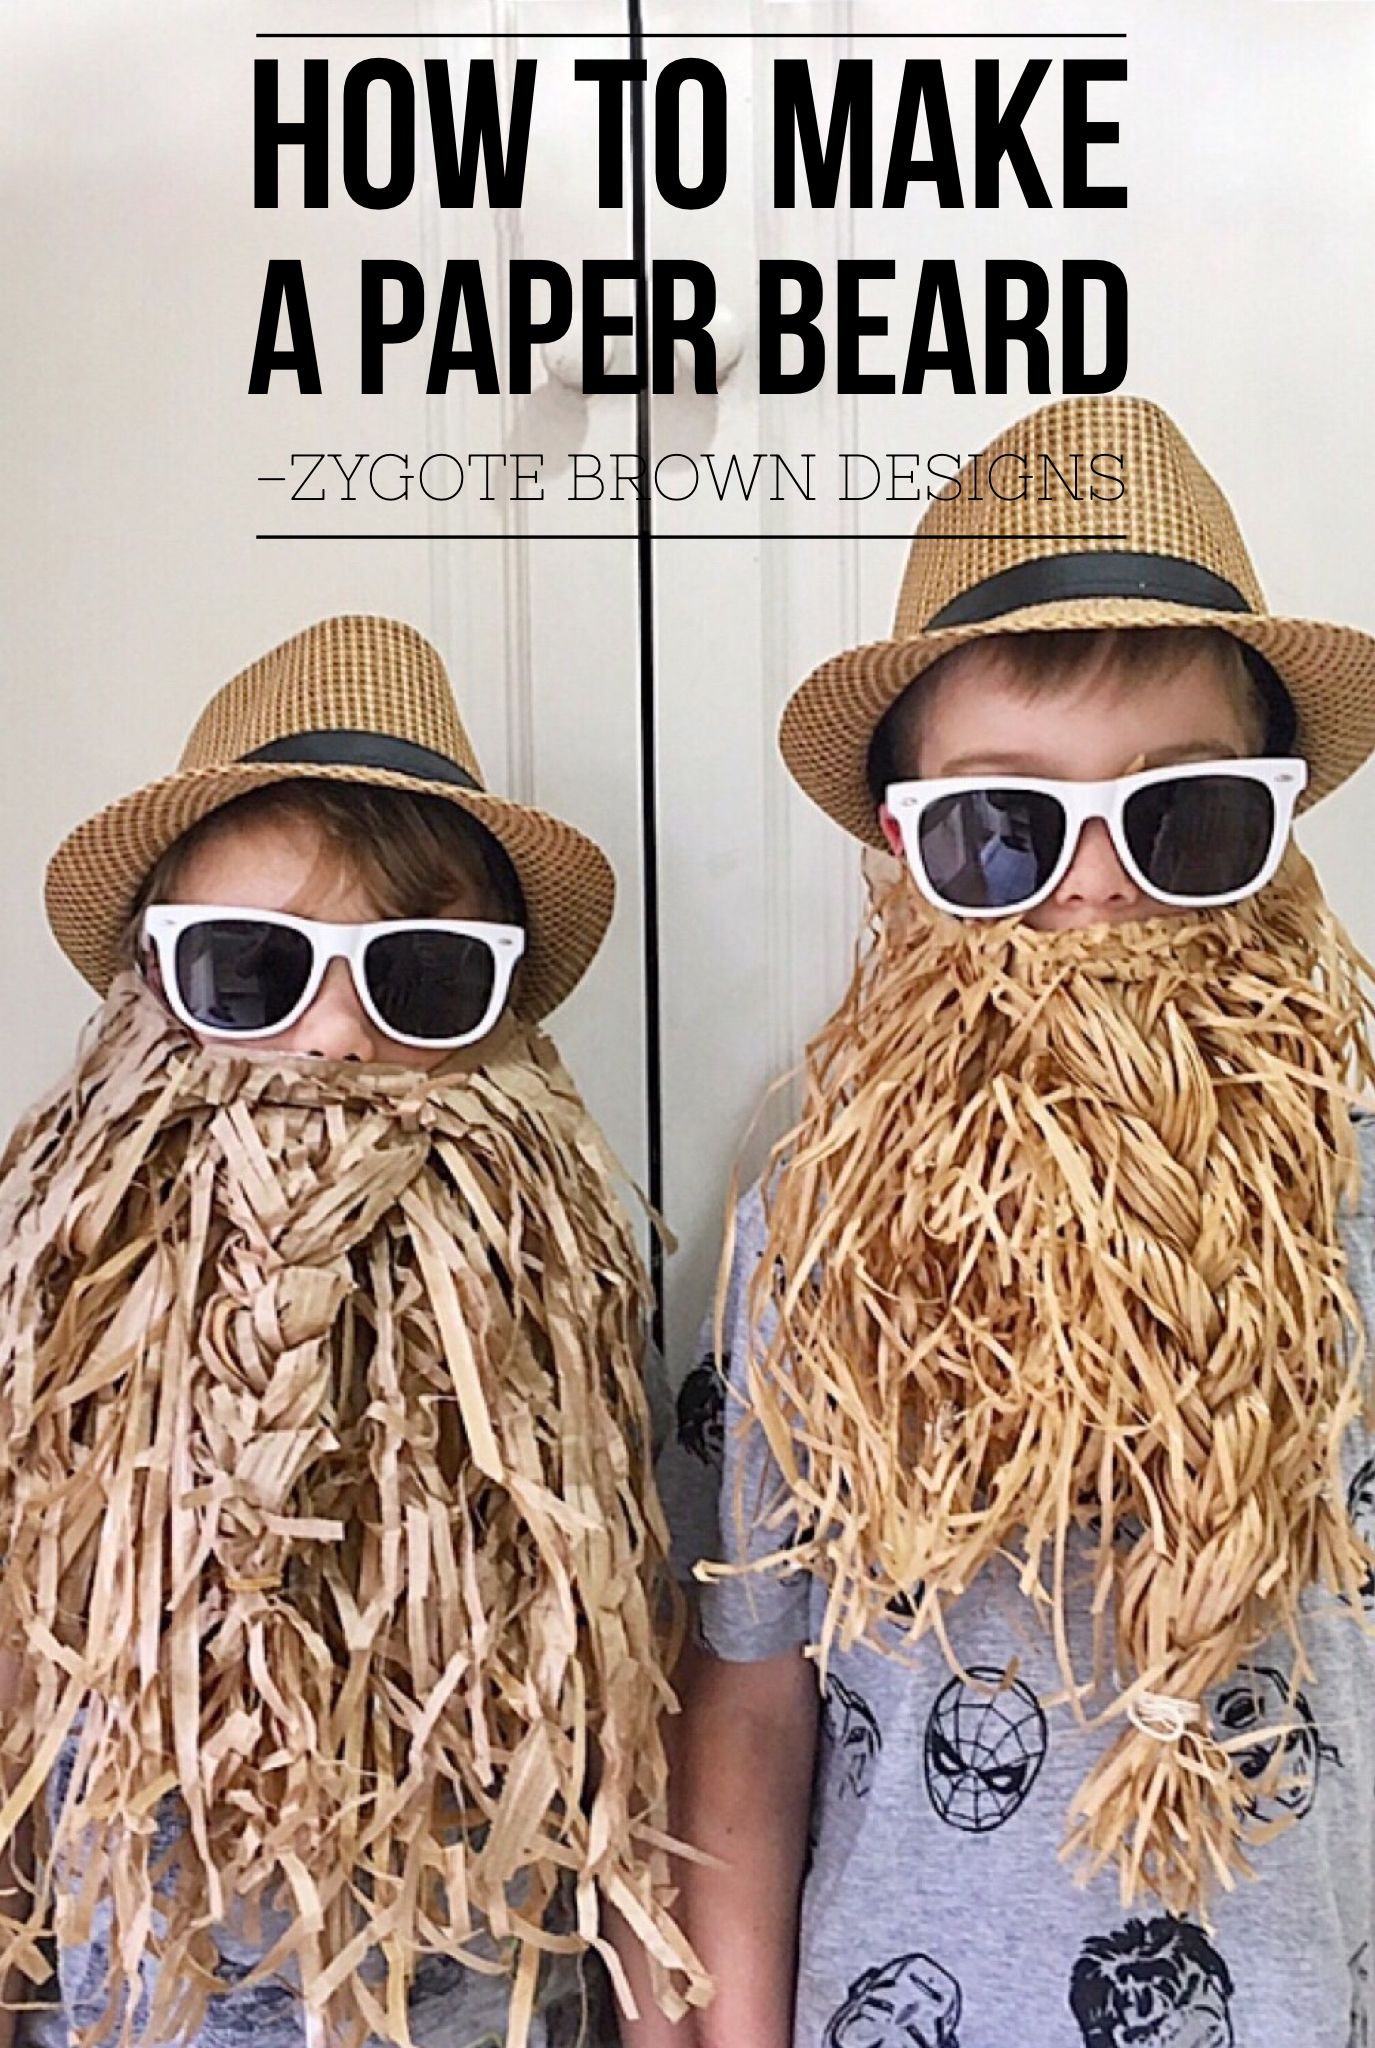 How to make a paper beard